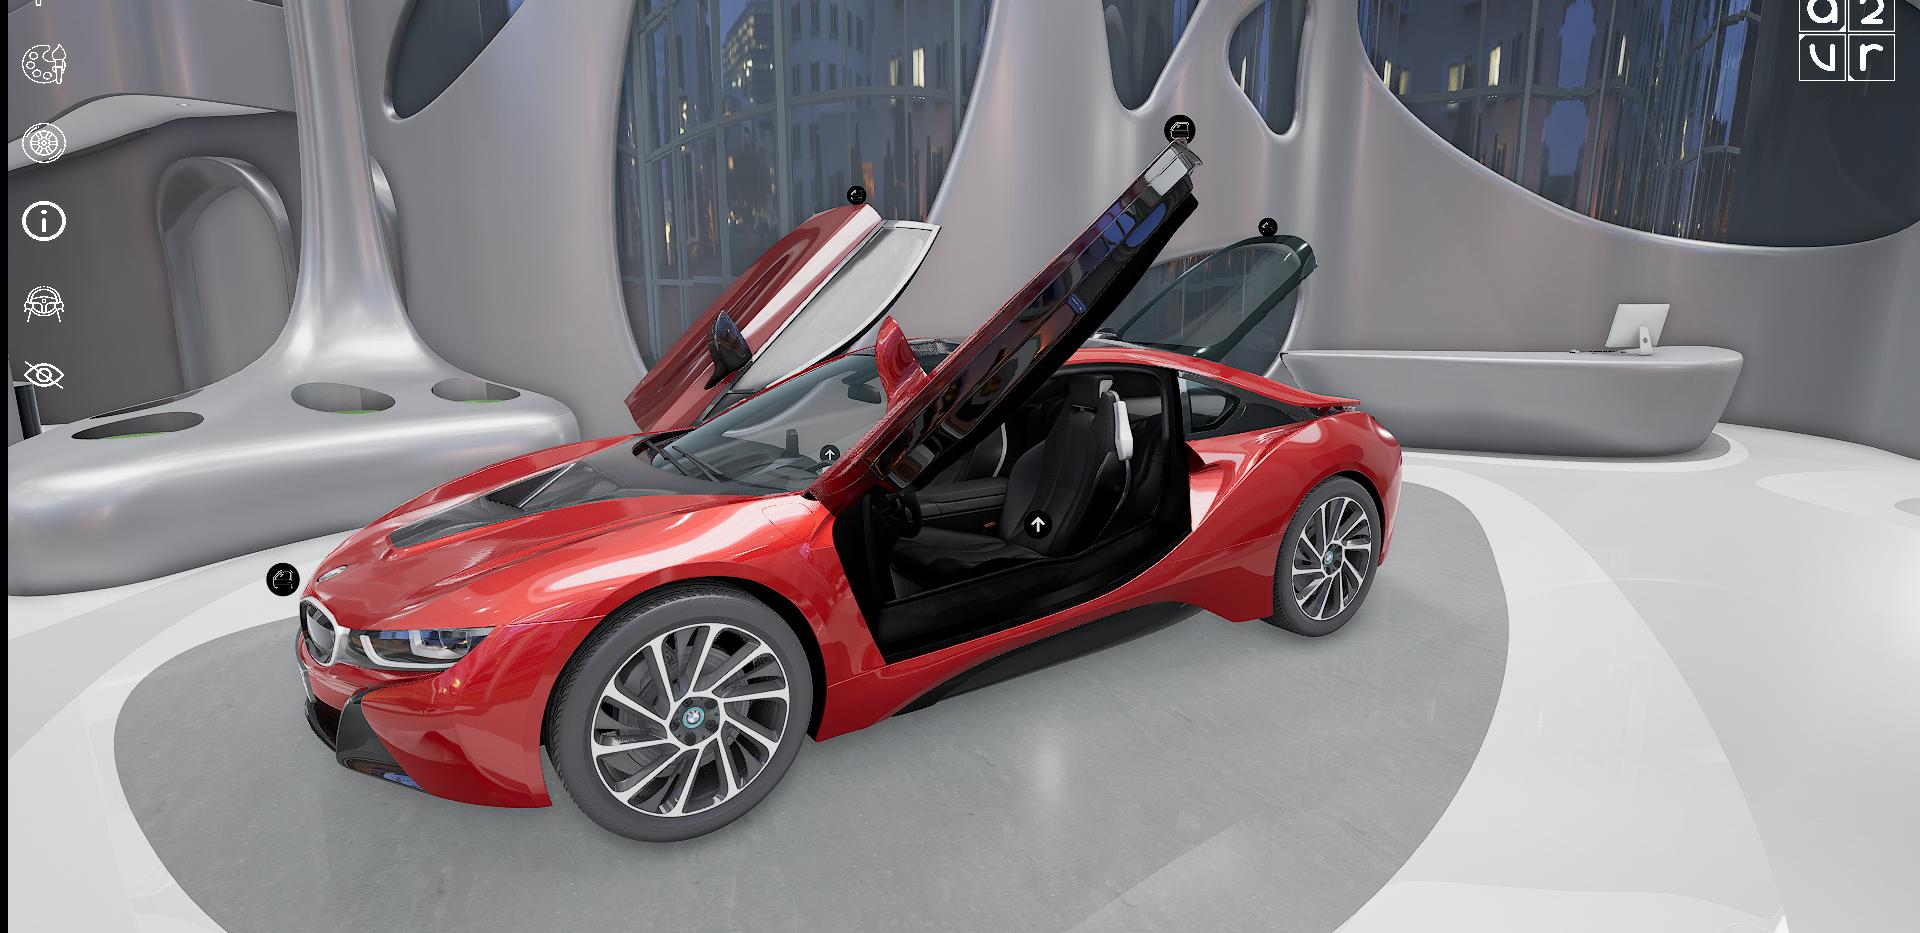 Virtual Automobile Showroom